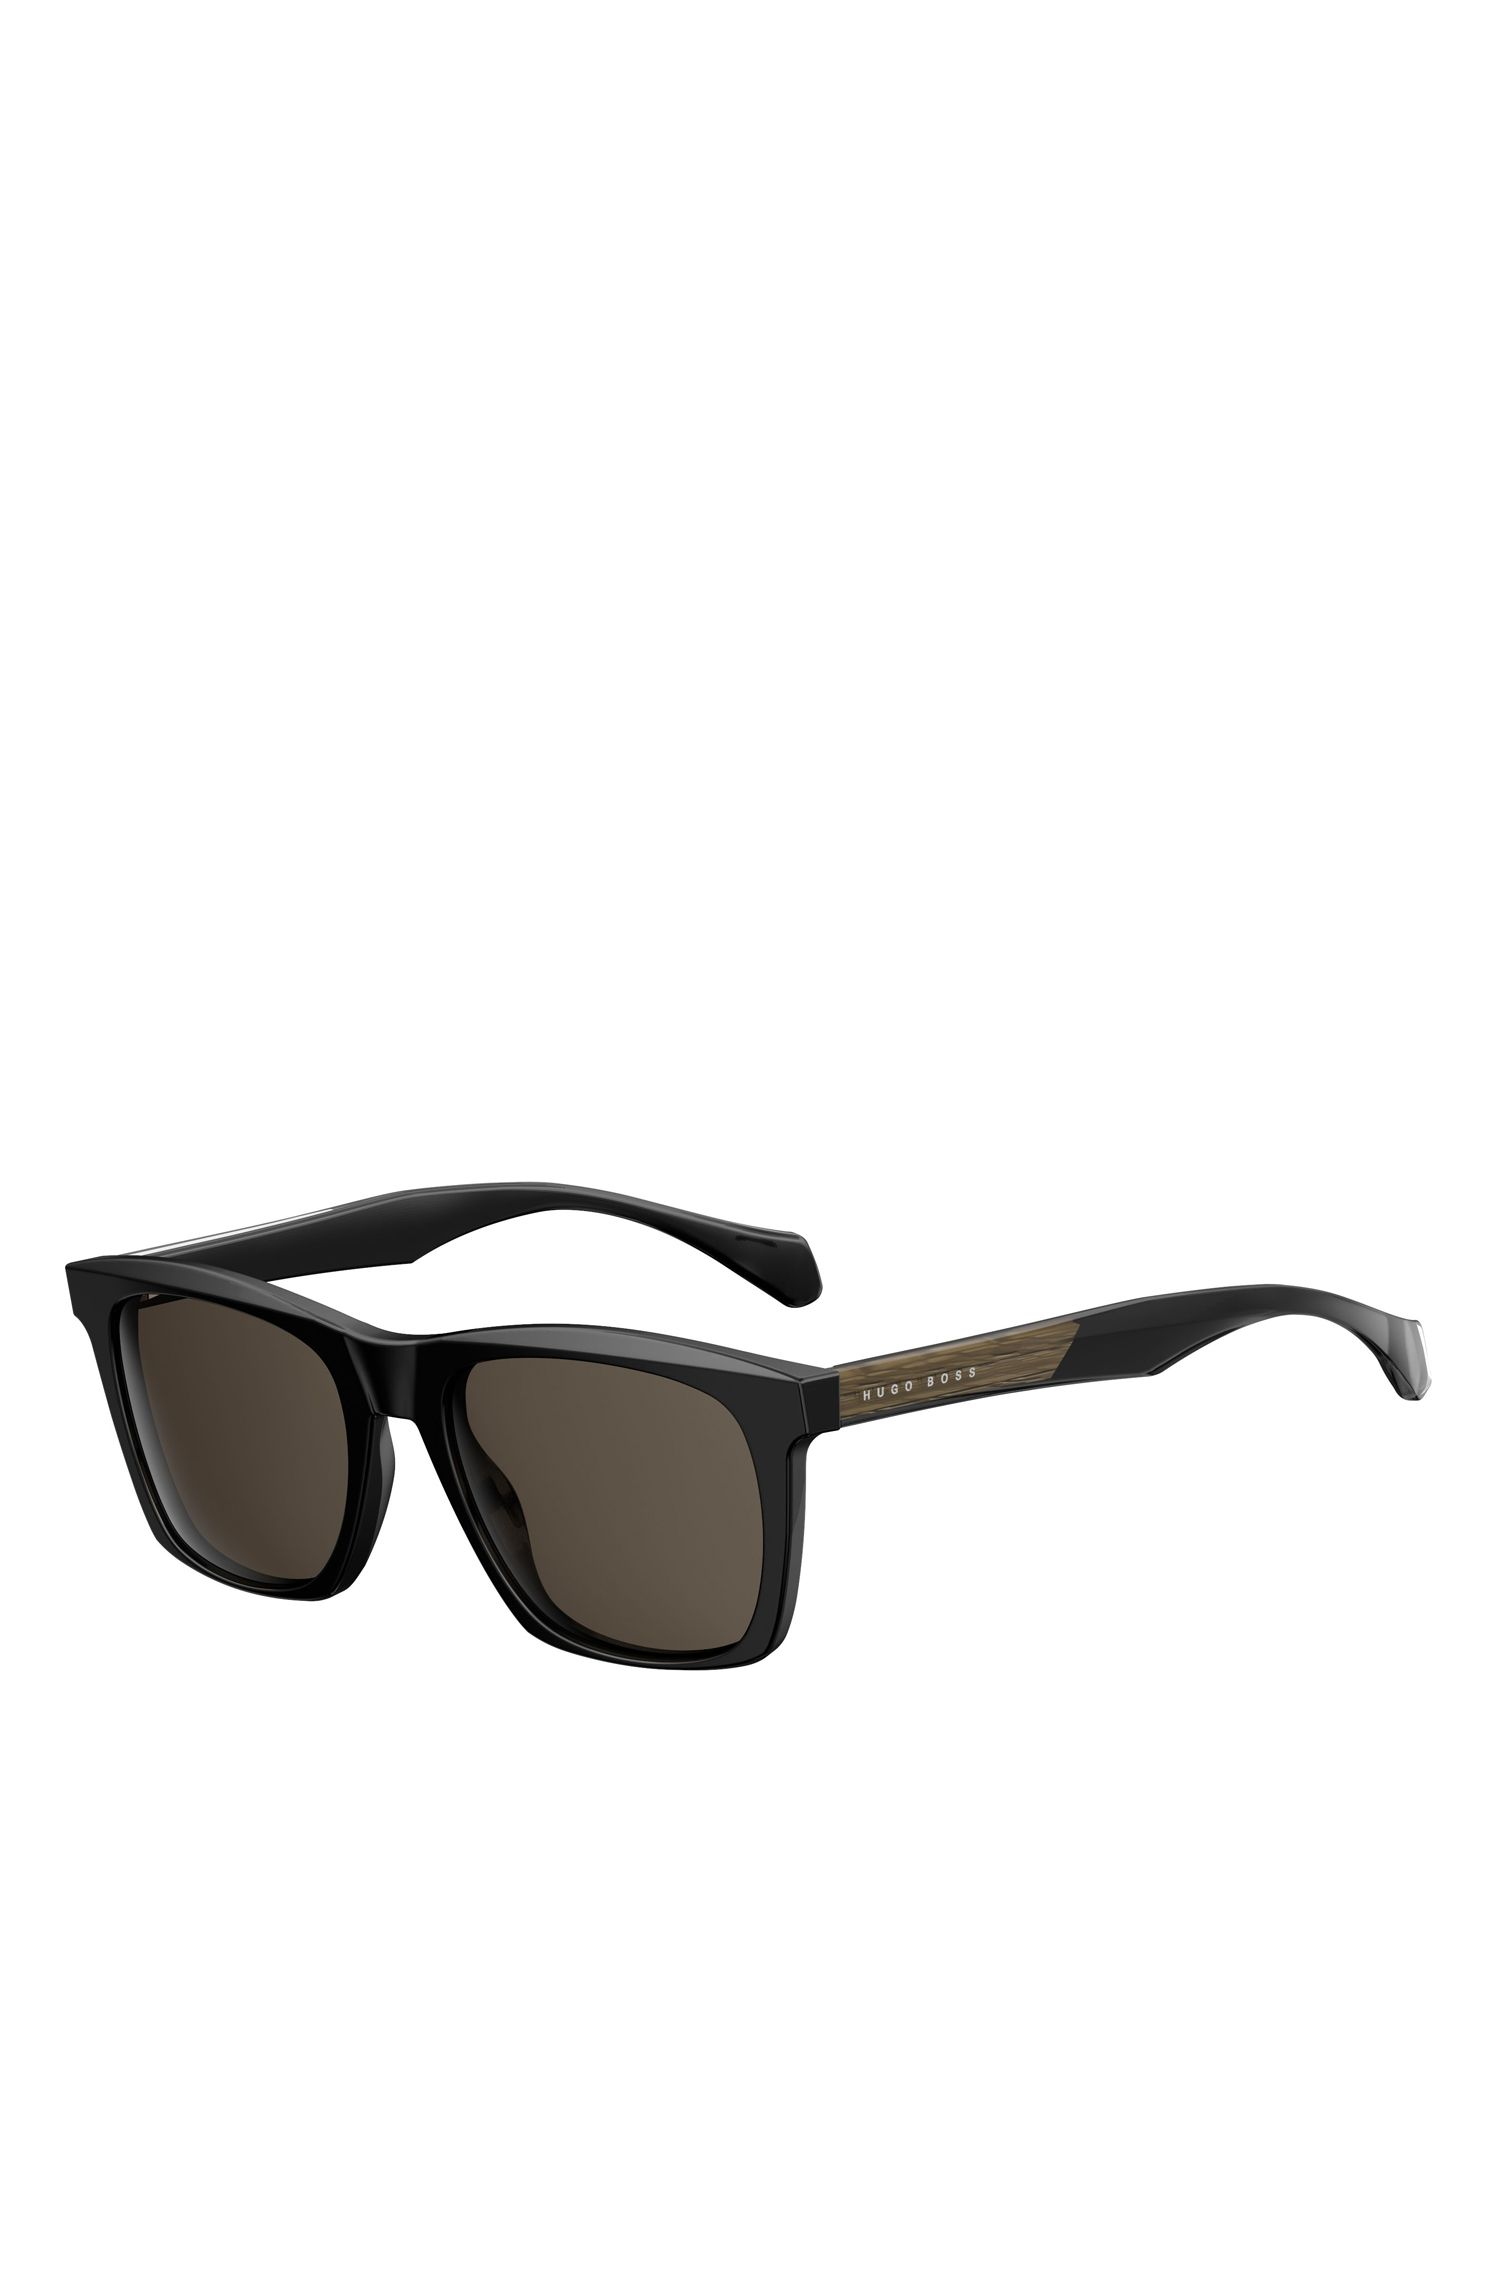 'BOSS 0911/S' | Black Acetate Rectangular Sunglasses